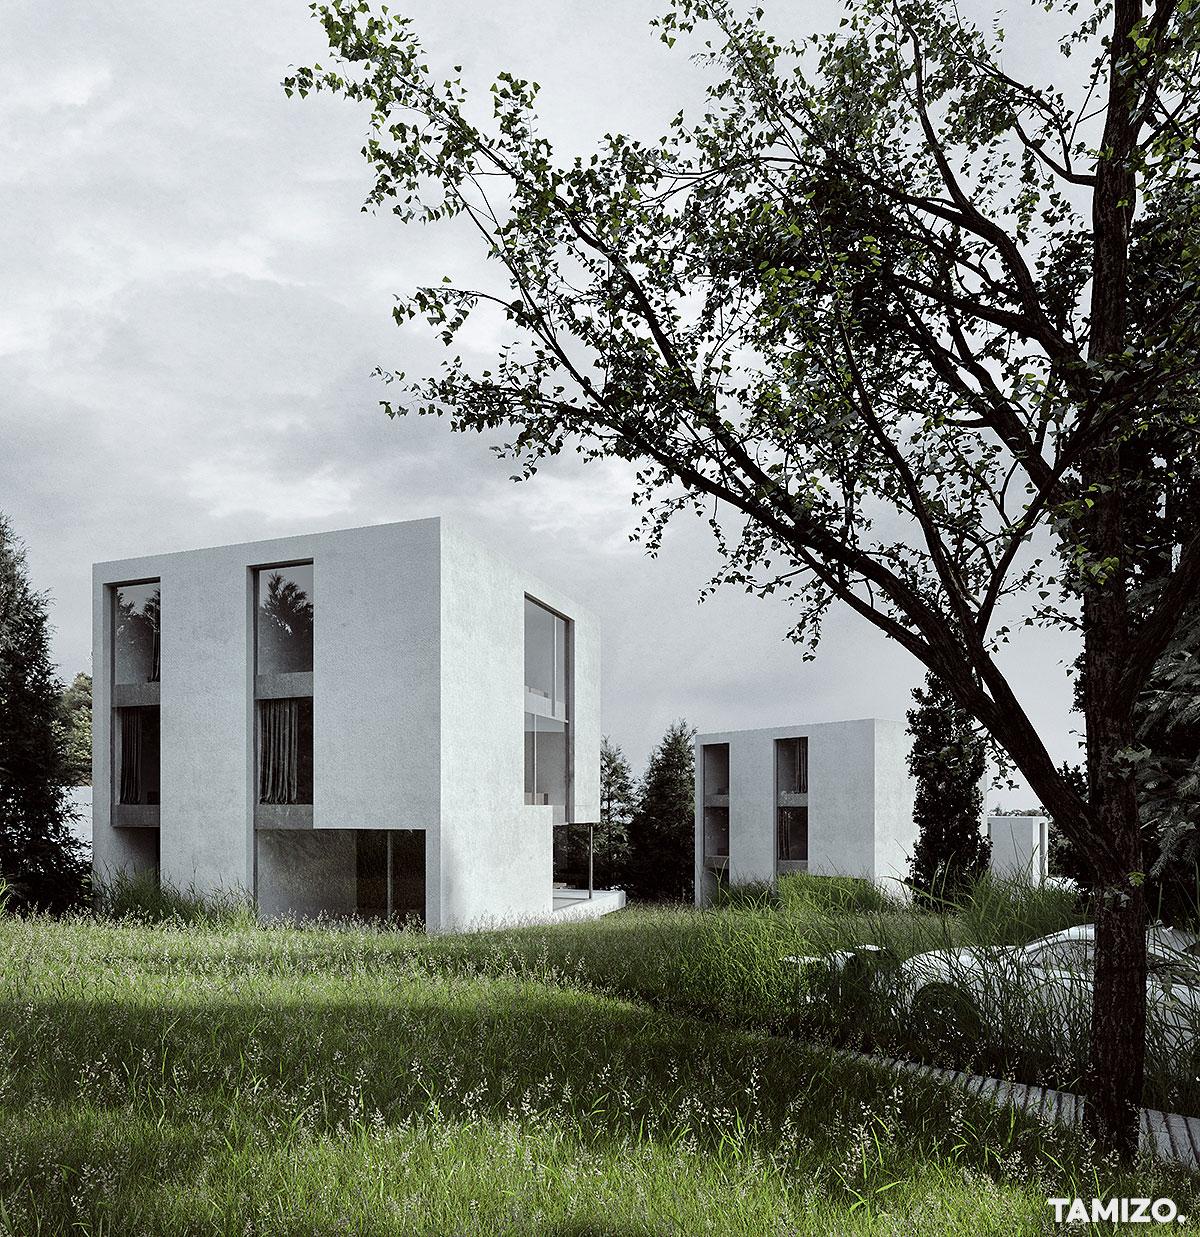 A061_tamizo_architects_competition_tbilisi_georgia_multifamily_houseing_realestate_10